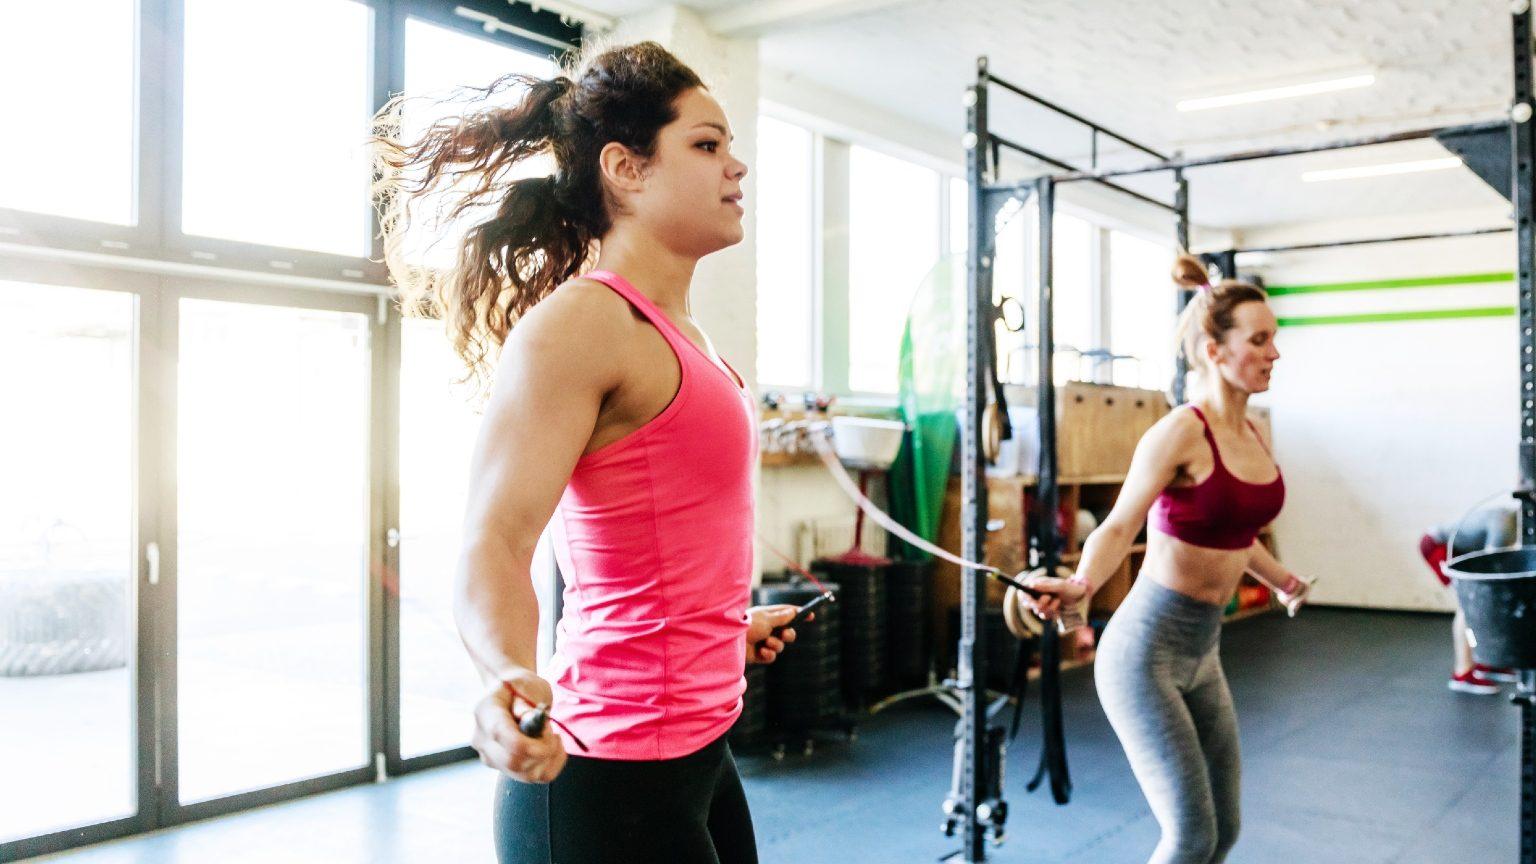 two ladies skipping rope